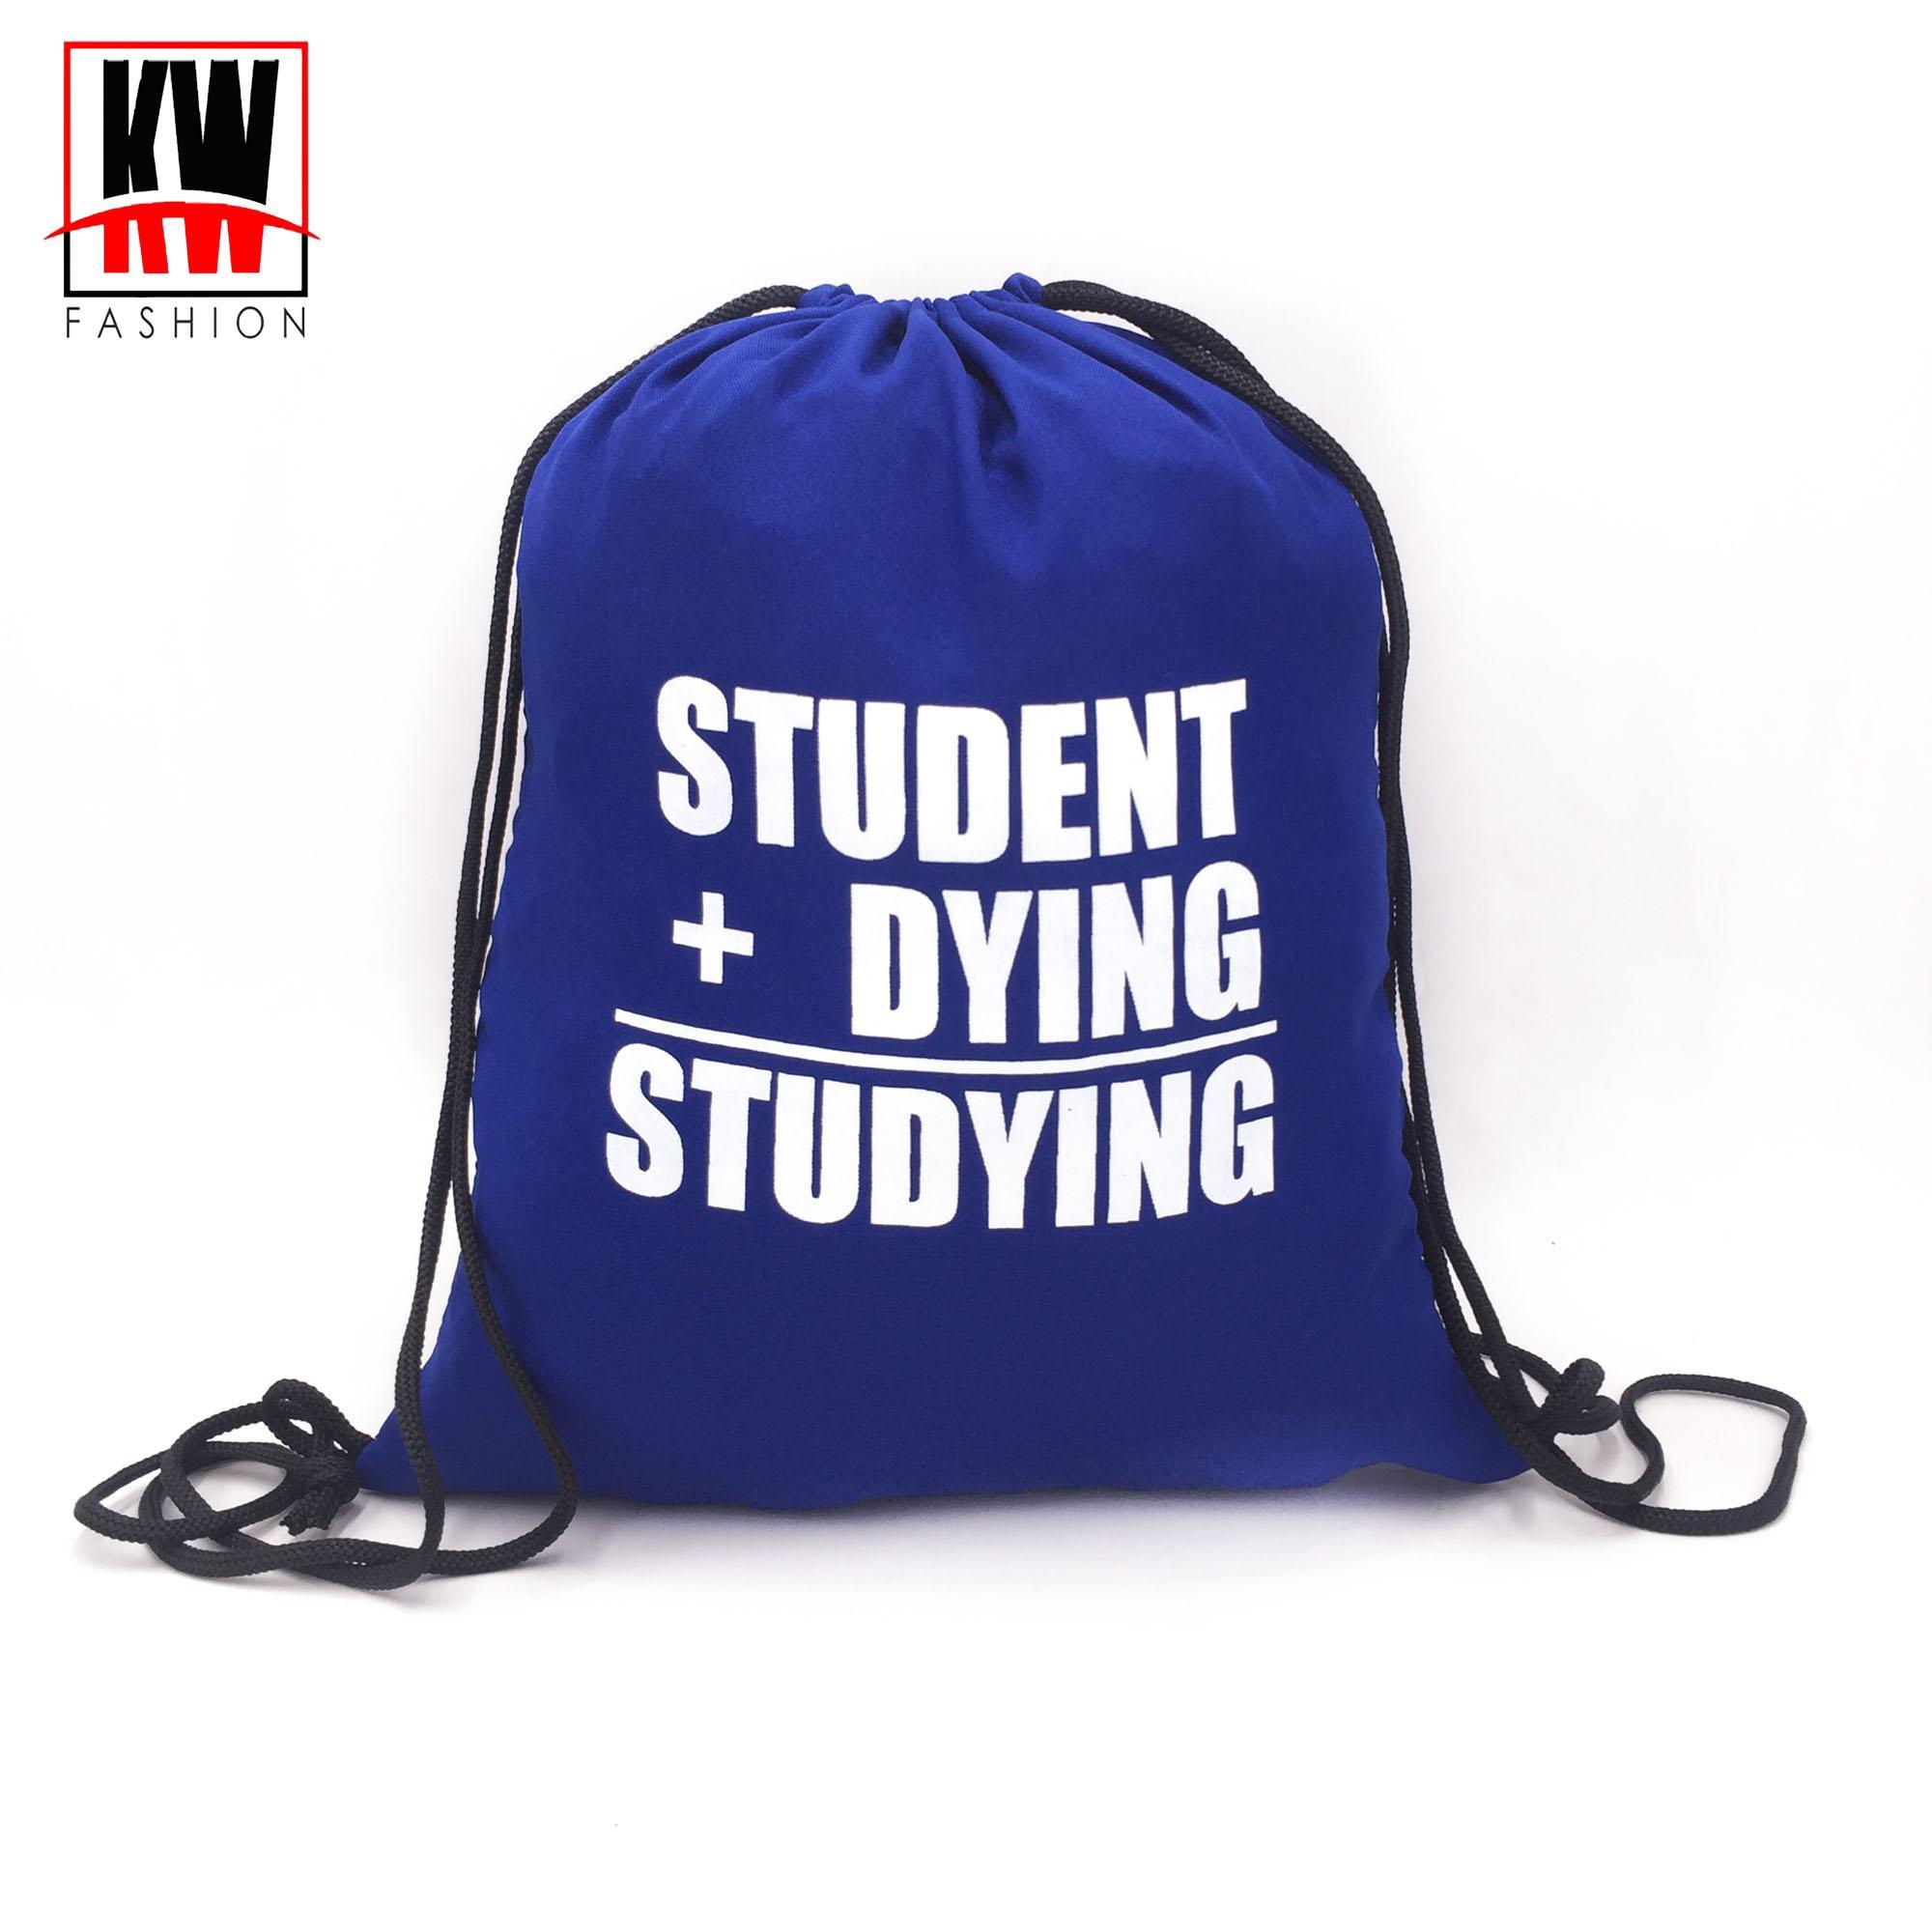 ff012b786984 KW String Bag